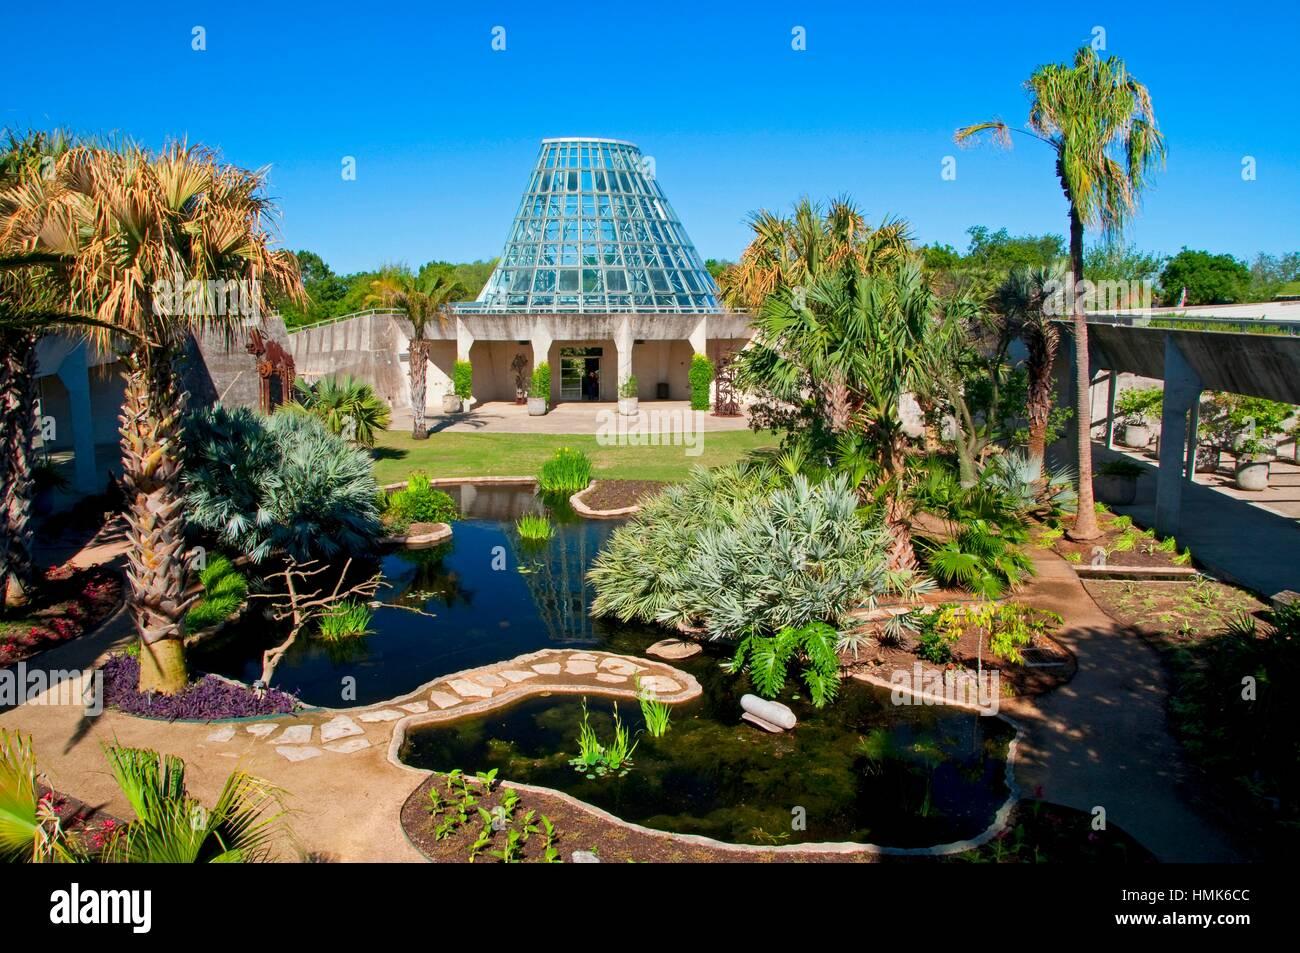 Lucile Halsell Conservatory, San Antonio Botanical Garden, San Antonio,  Texas